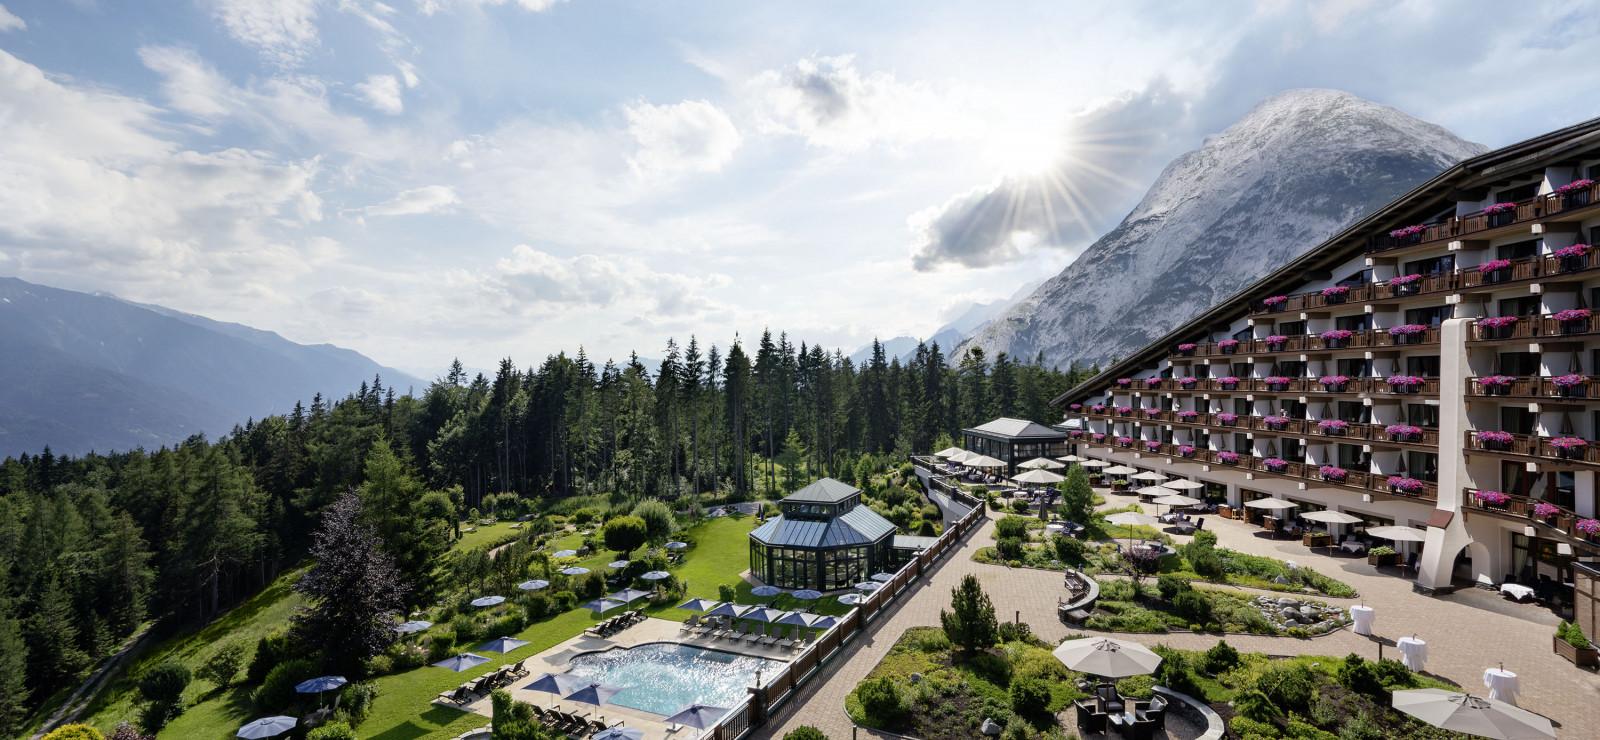 Wellnesshotel Interalpen - Hotel Tyrol GmbH | Buchen/Seefeld